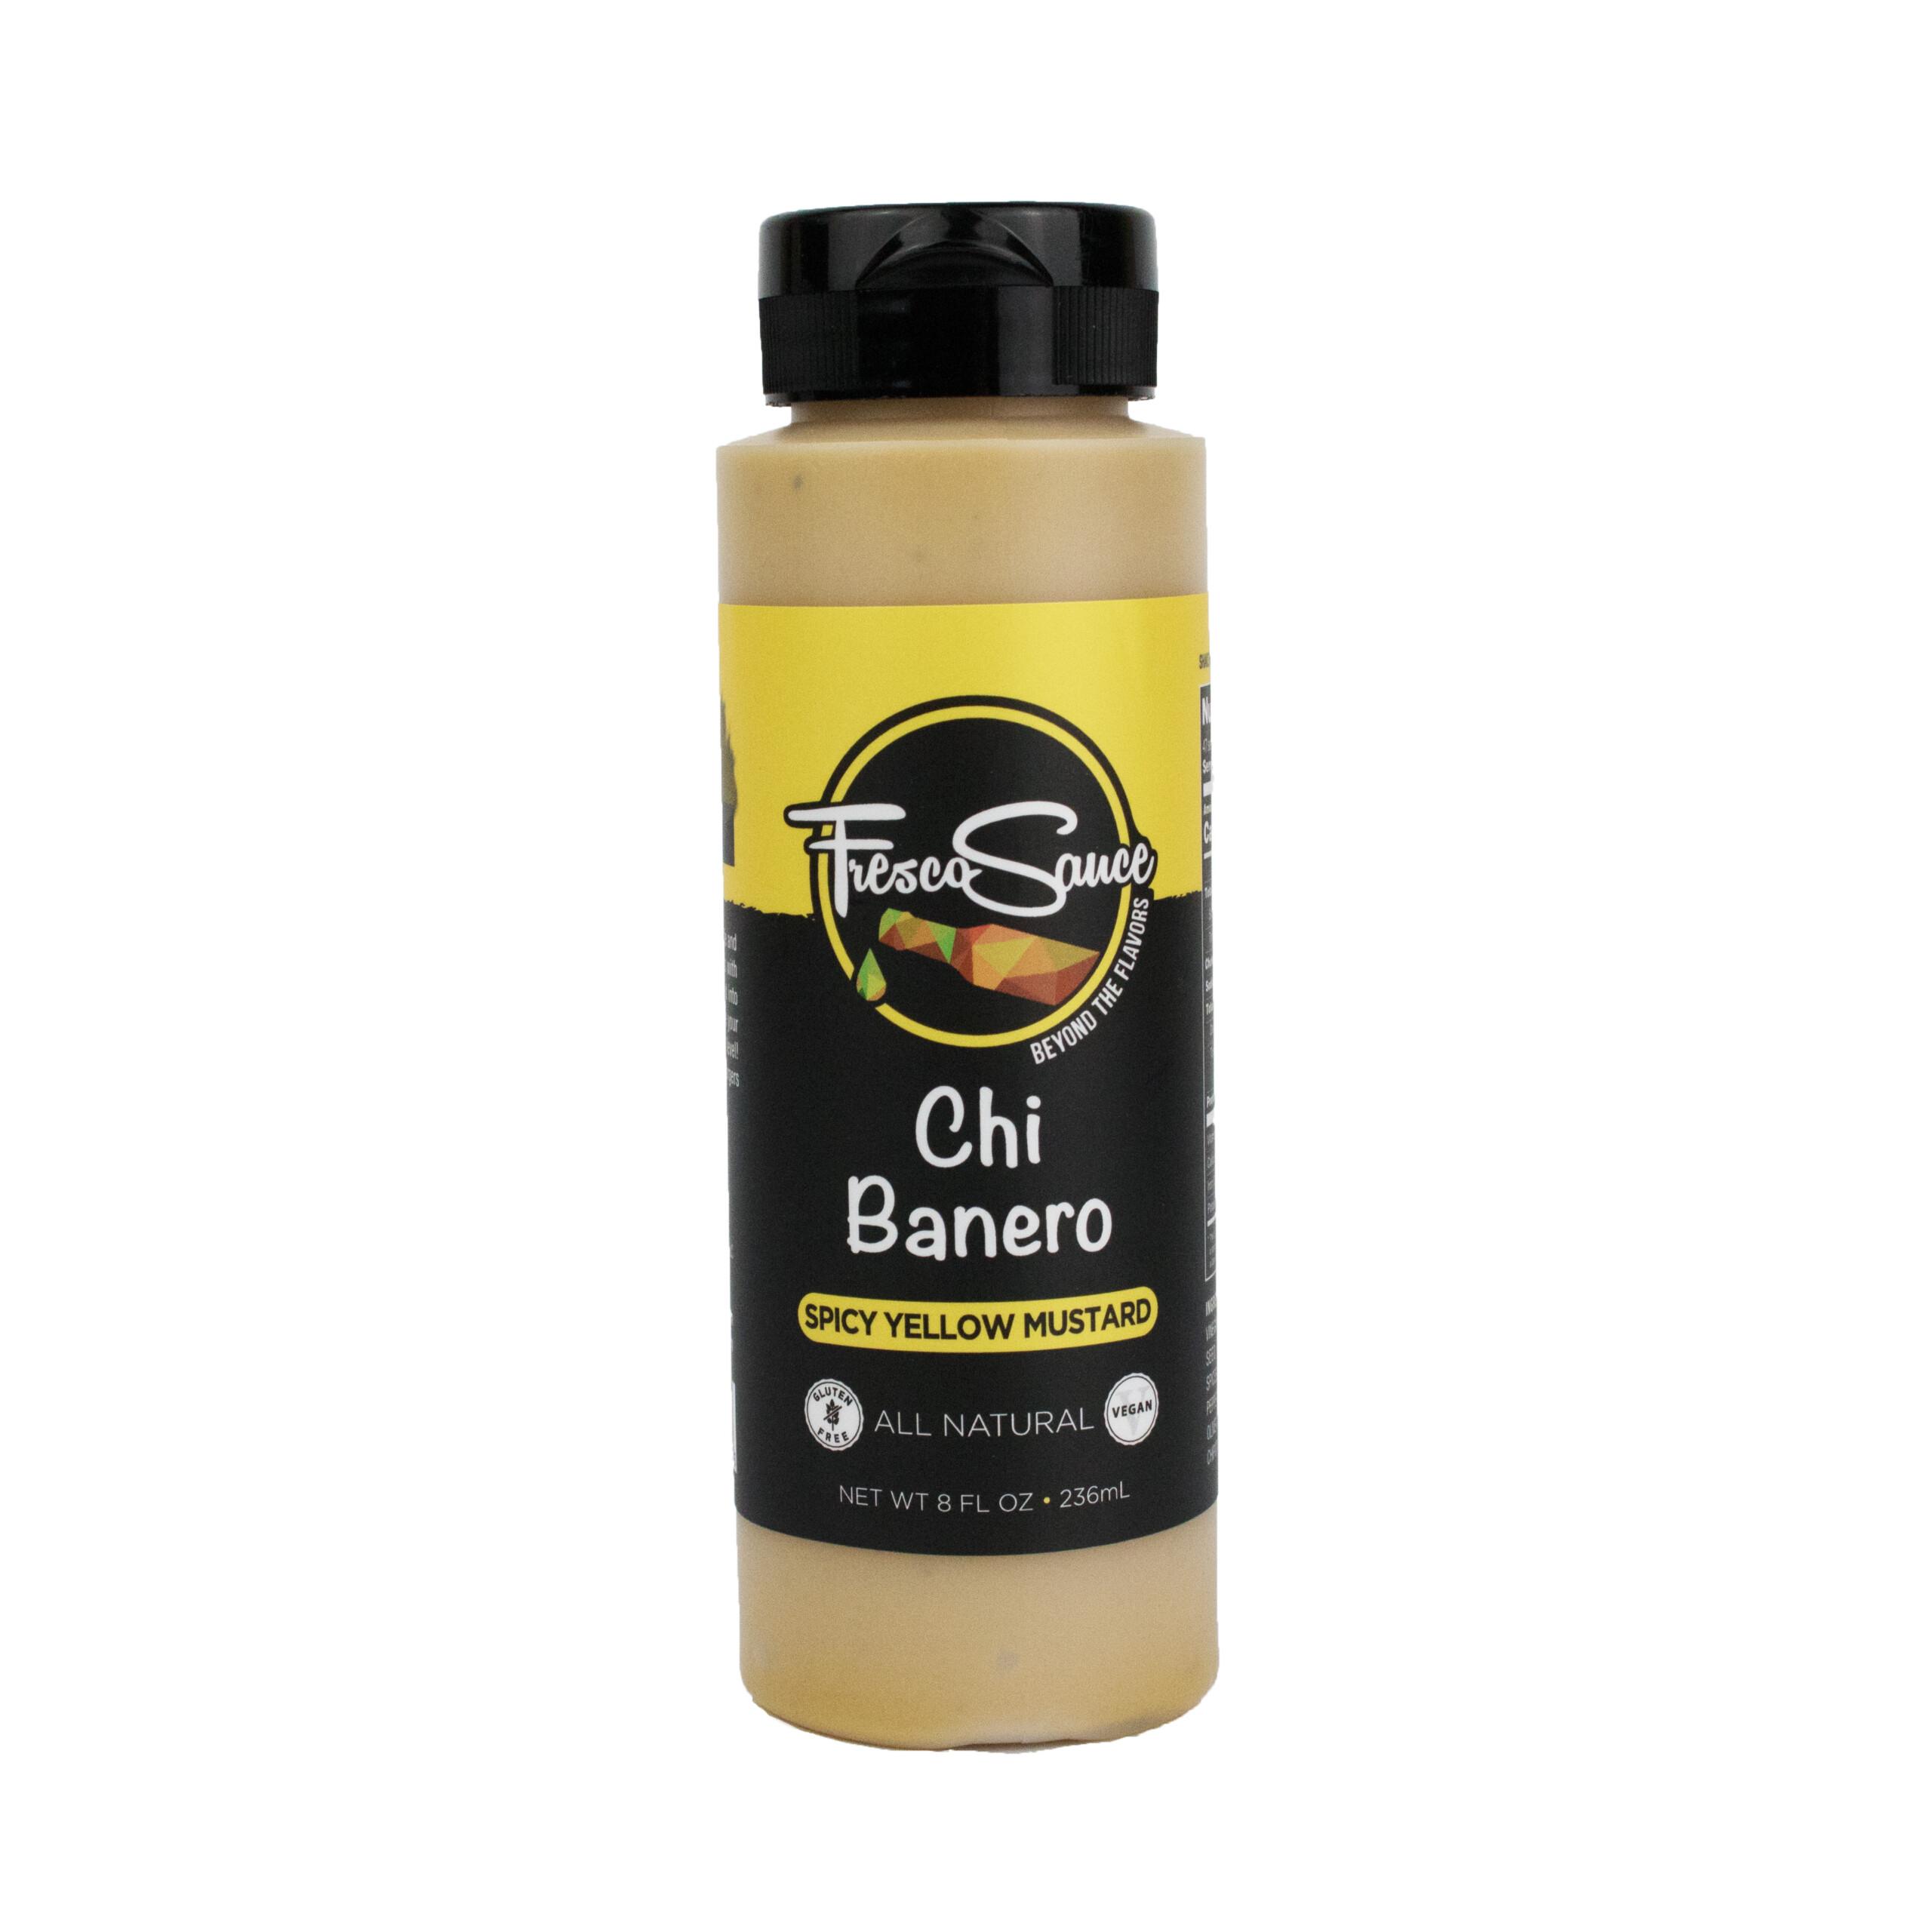 61. Chi Banero Spicy Mustard – Medium